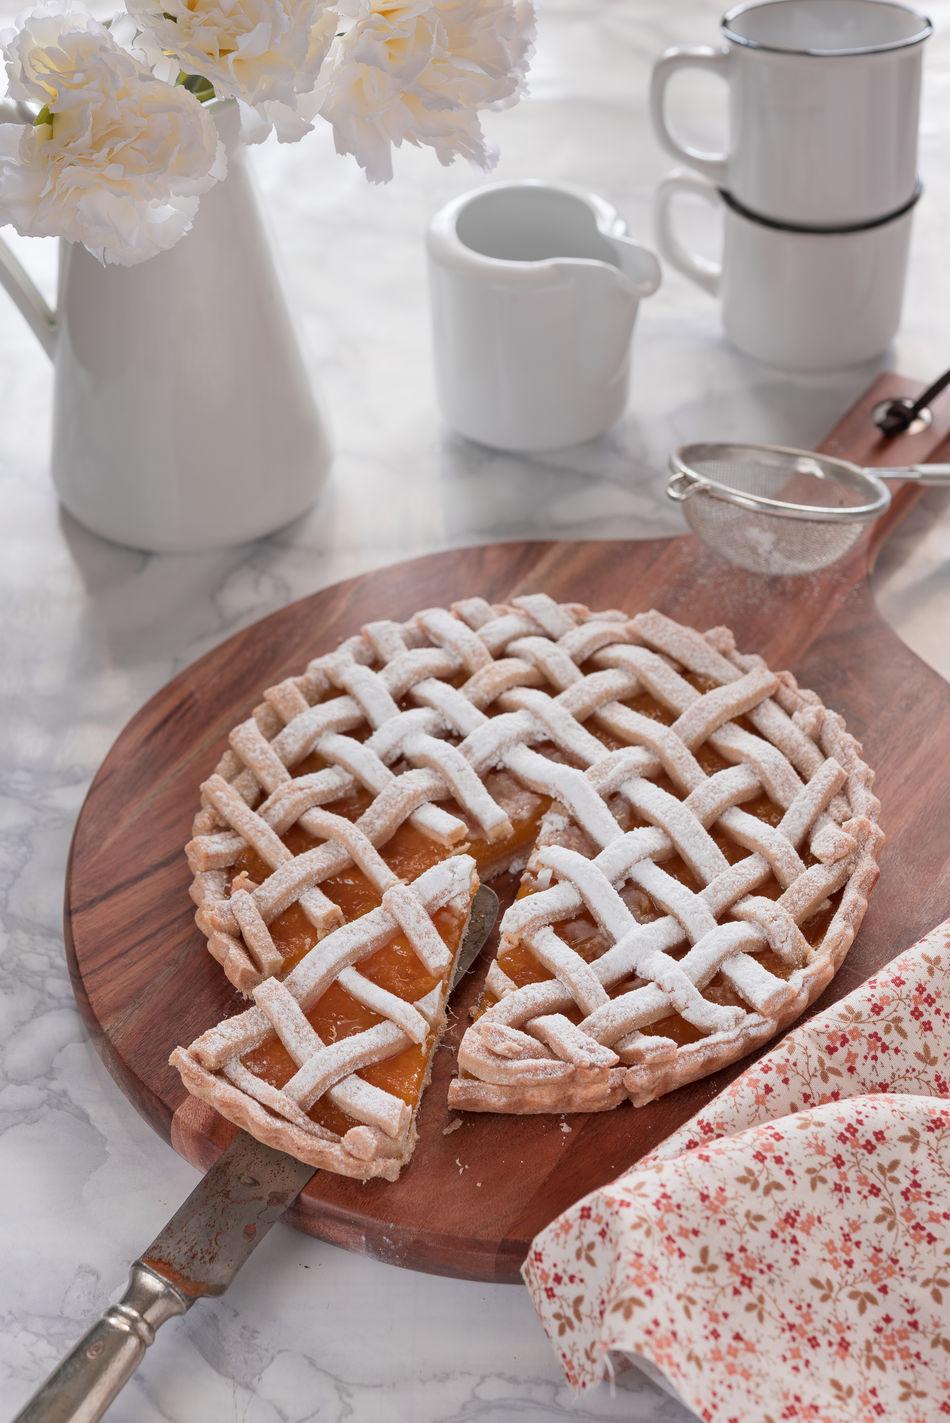 Beautiful stock photos of kuchen,  Close-Up,  Cup,  Day,  Dessert